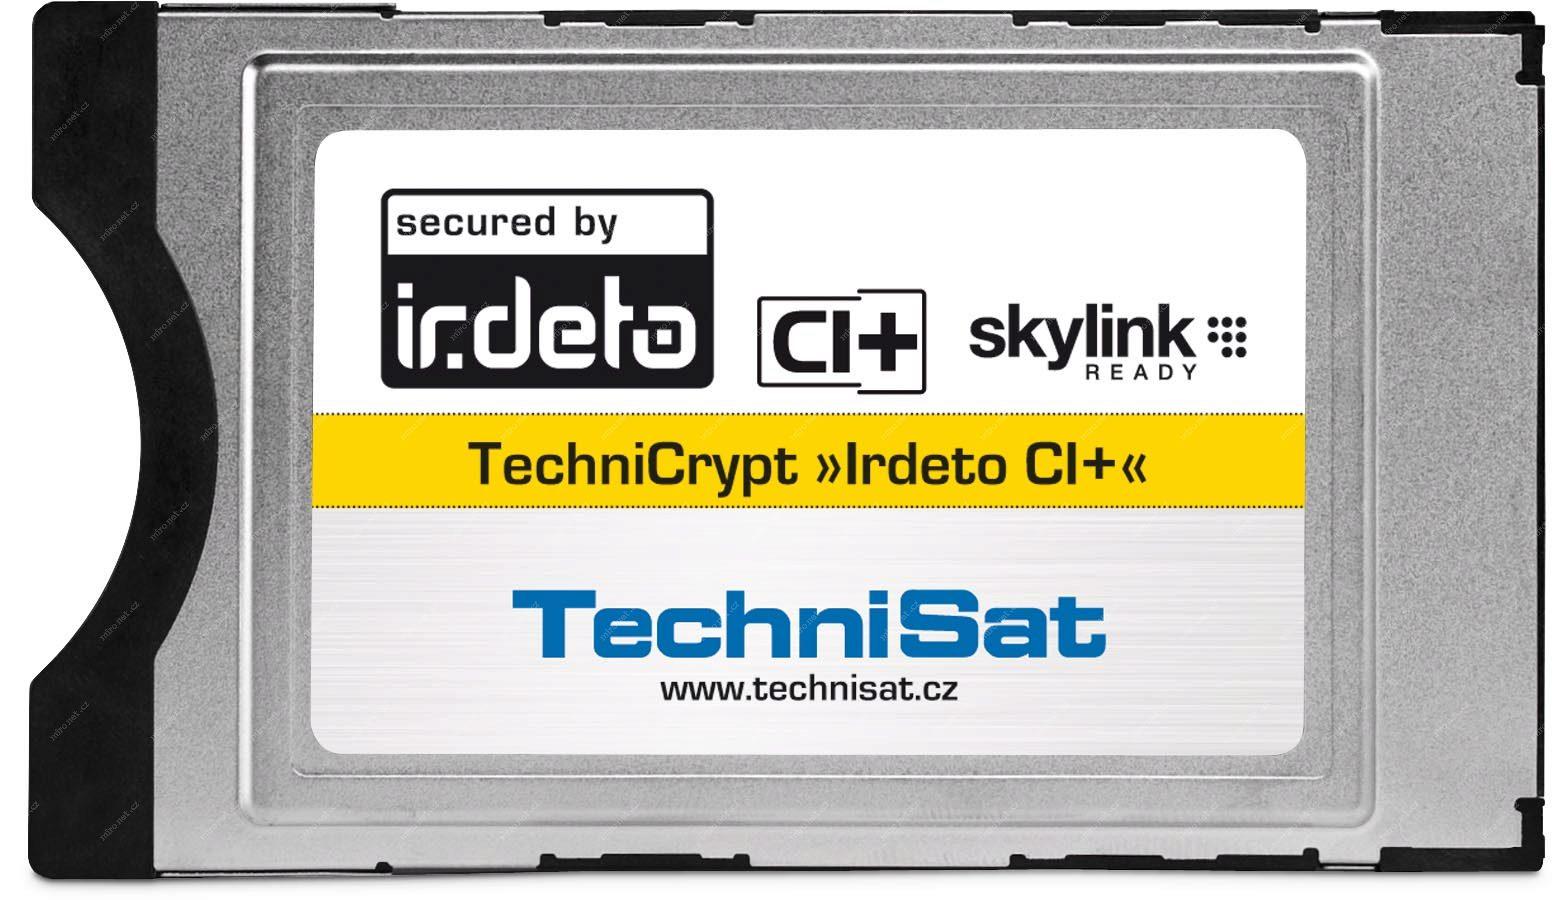 346d117a9 TECHNISAT CA modul TechniCrypt IRDETO CI+ Skylink (CZ/SK) | Mironet.cz